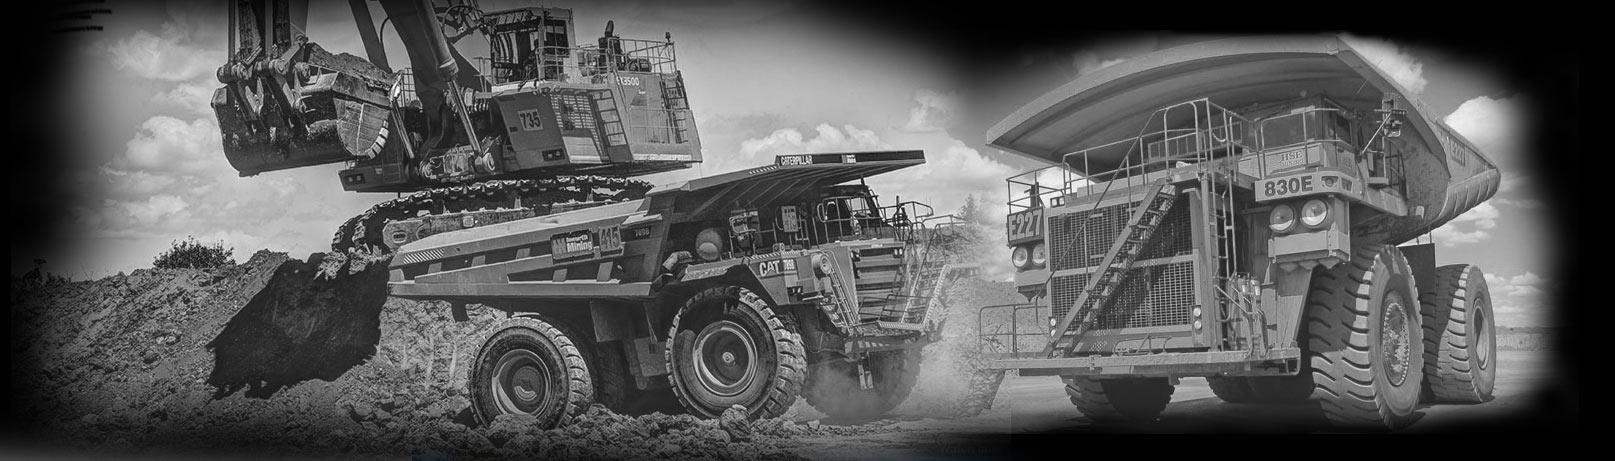 iMINCO Dump Truck Training Course